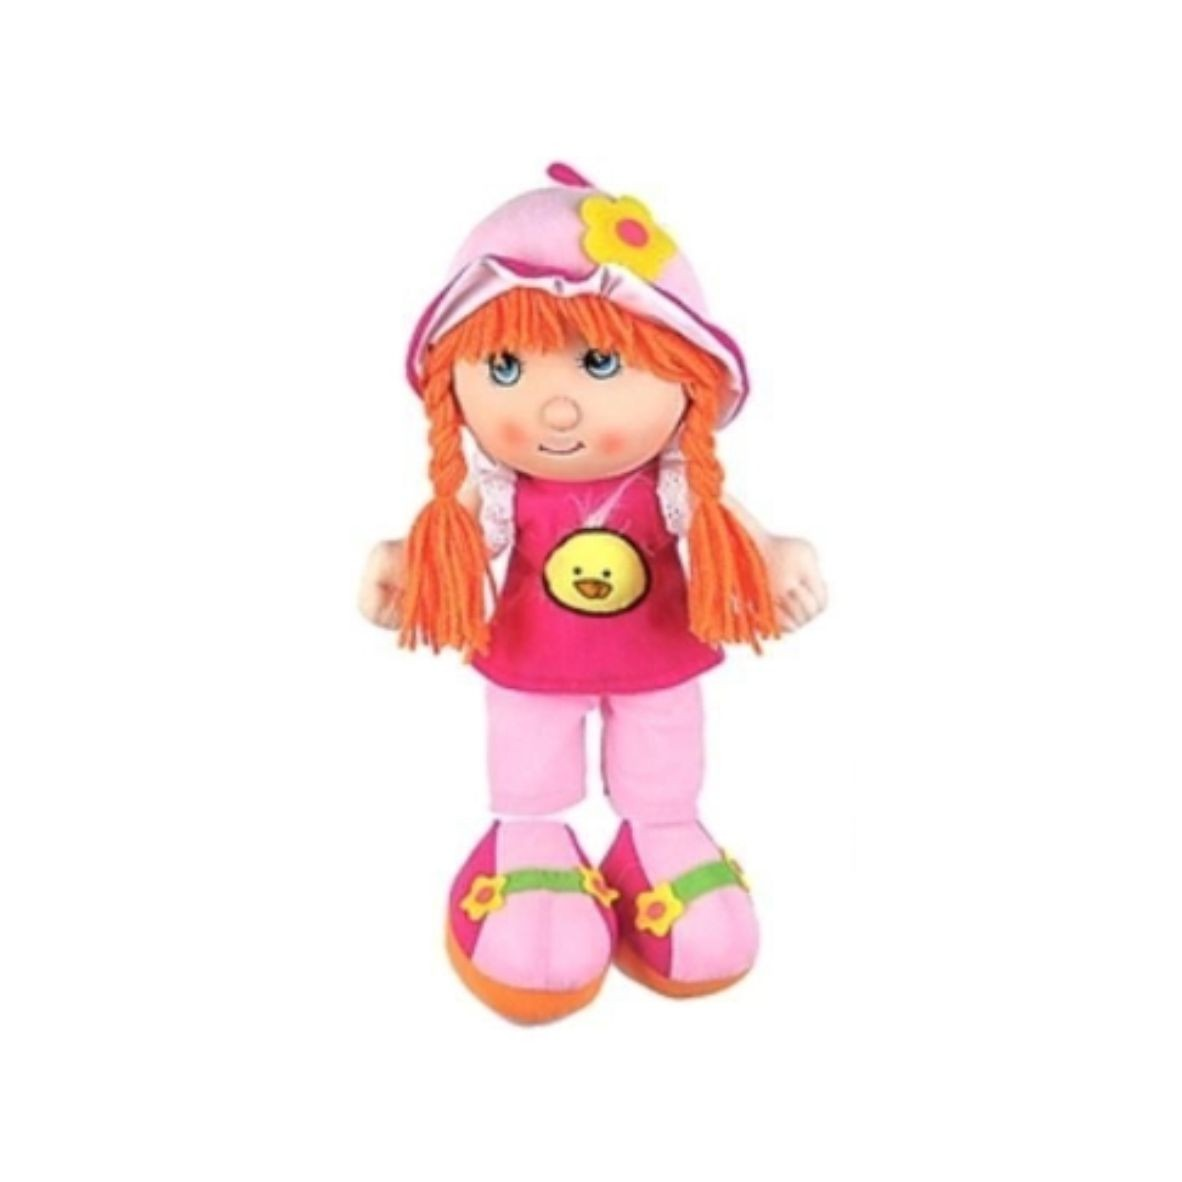 Boneca maria Chiquinha Pequena